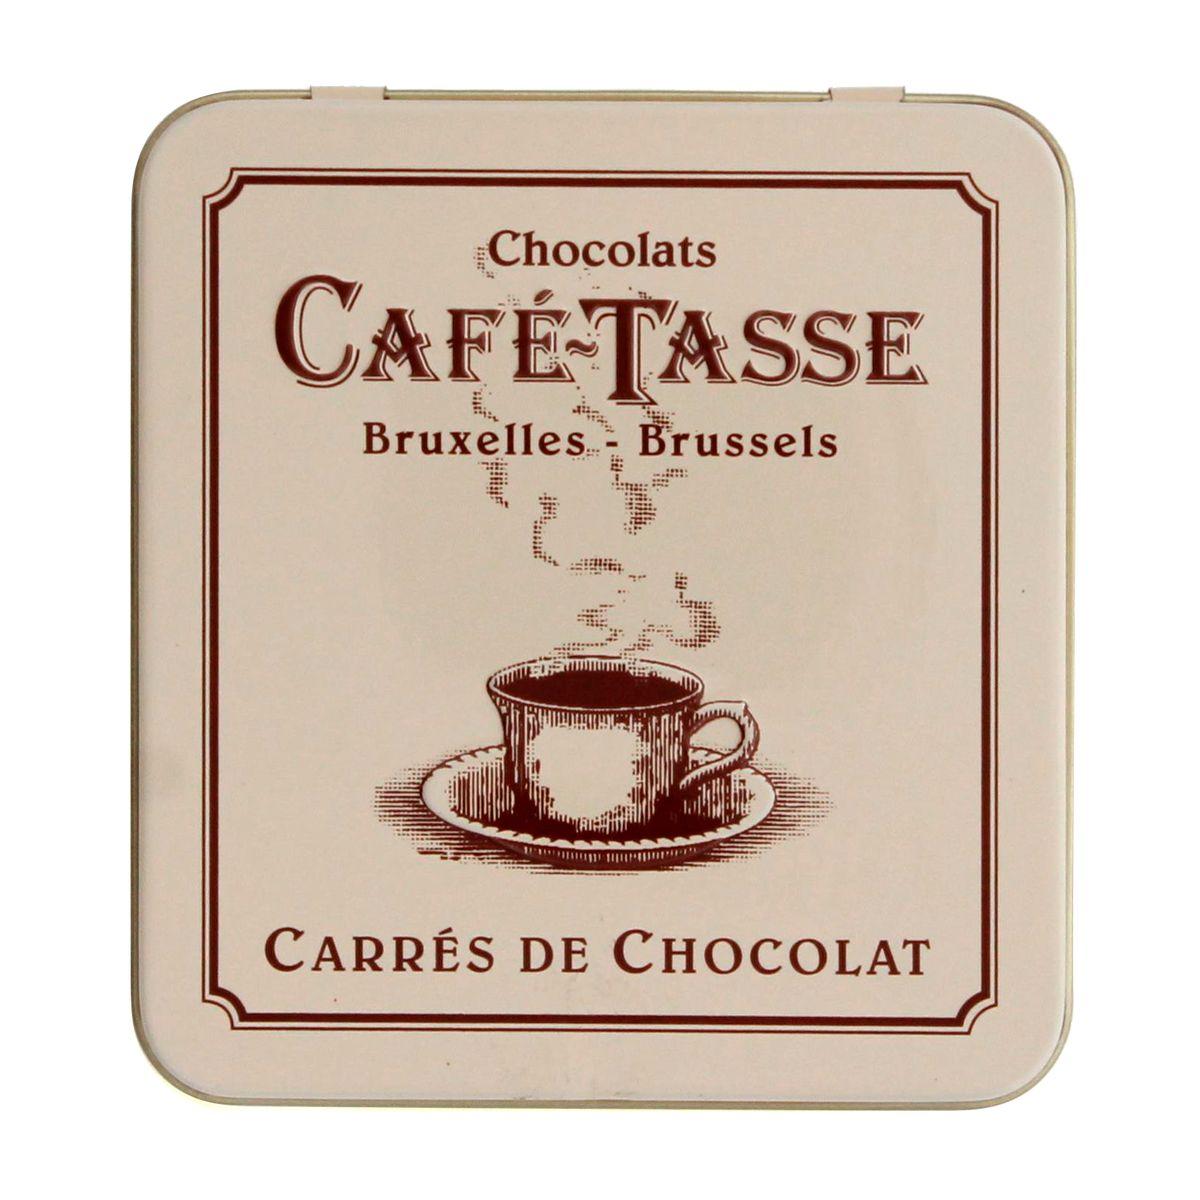 POCKET BOX 12 NAPOS ASSORTIS - CAFETASSE